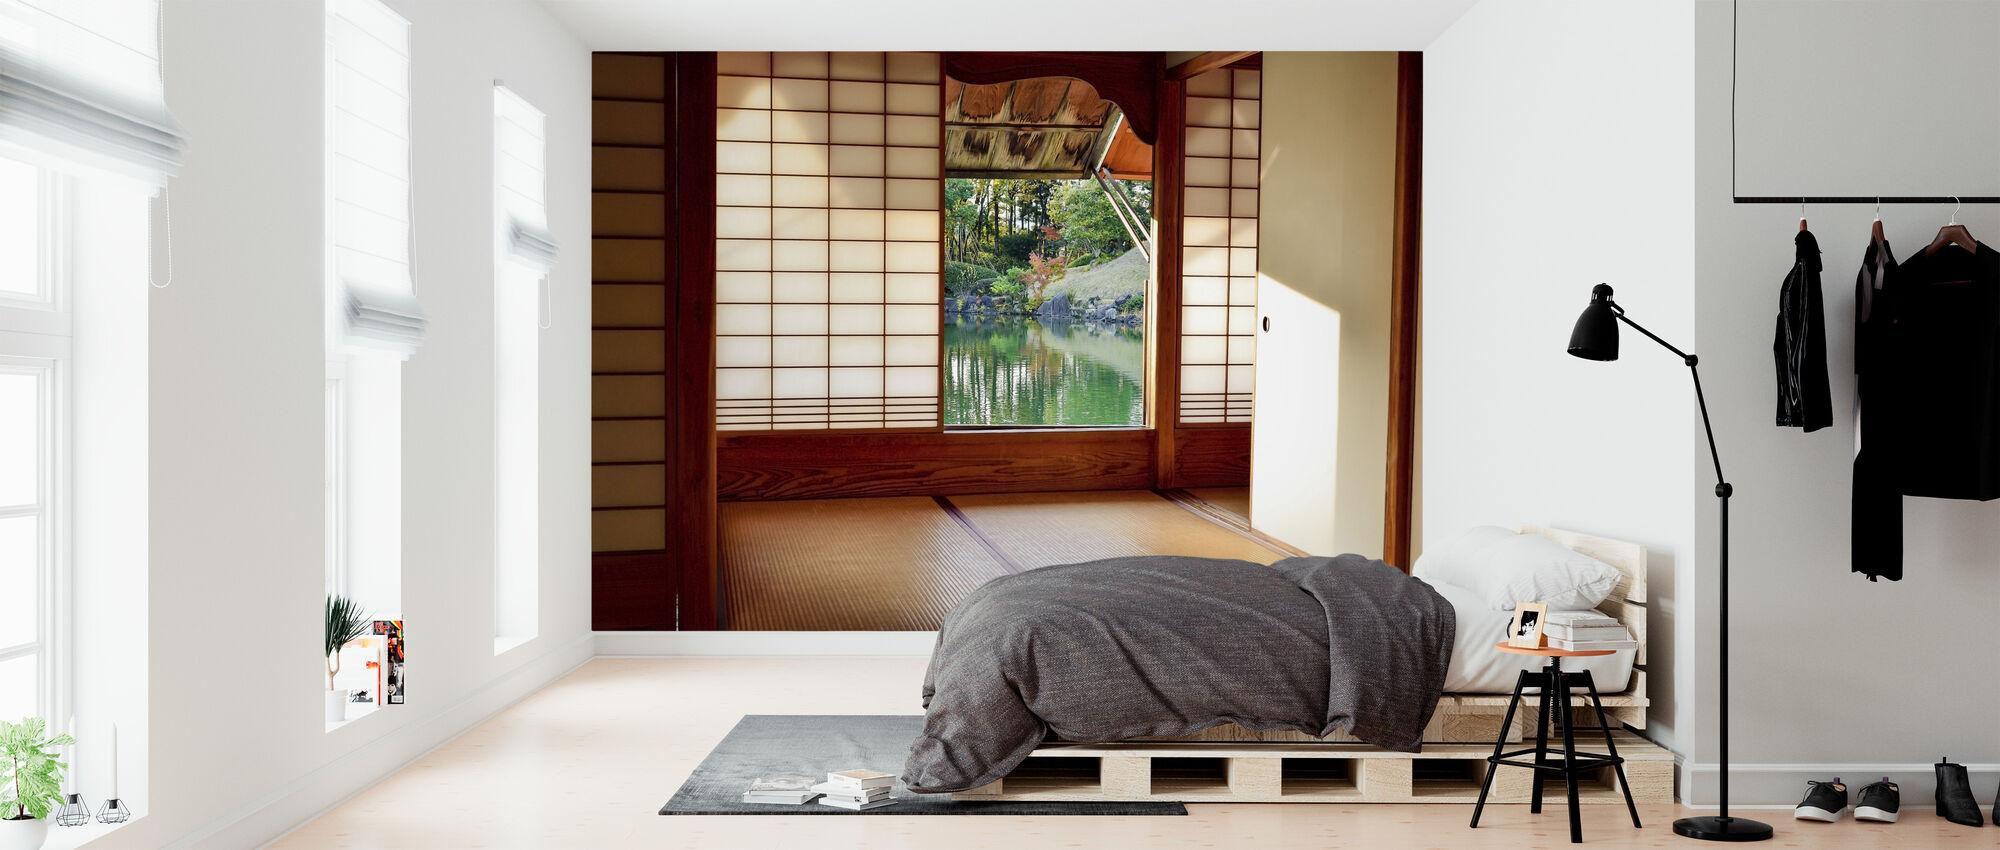 Japanese Room - Wallpaper - Bedroom